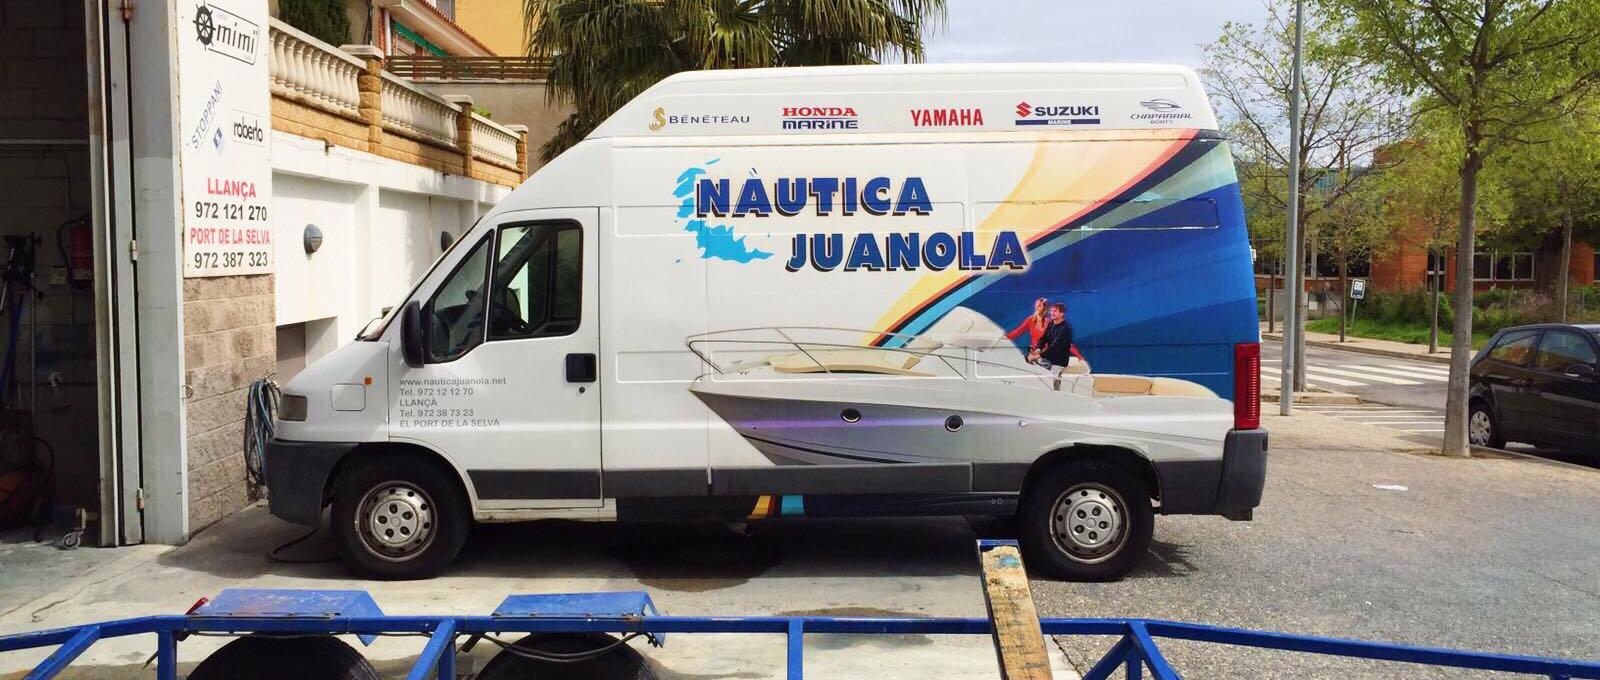 Nàutica Juanola